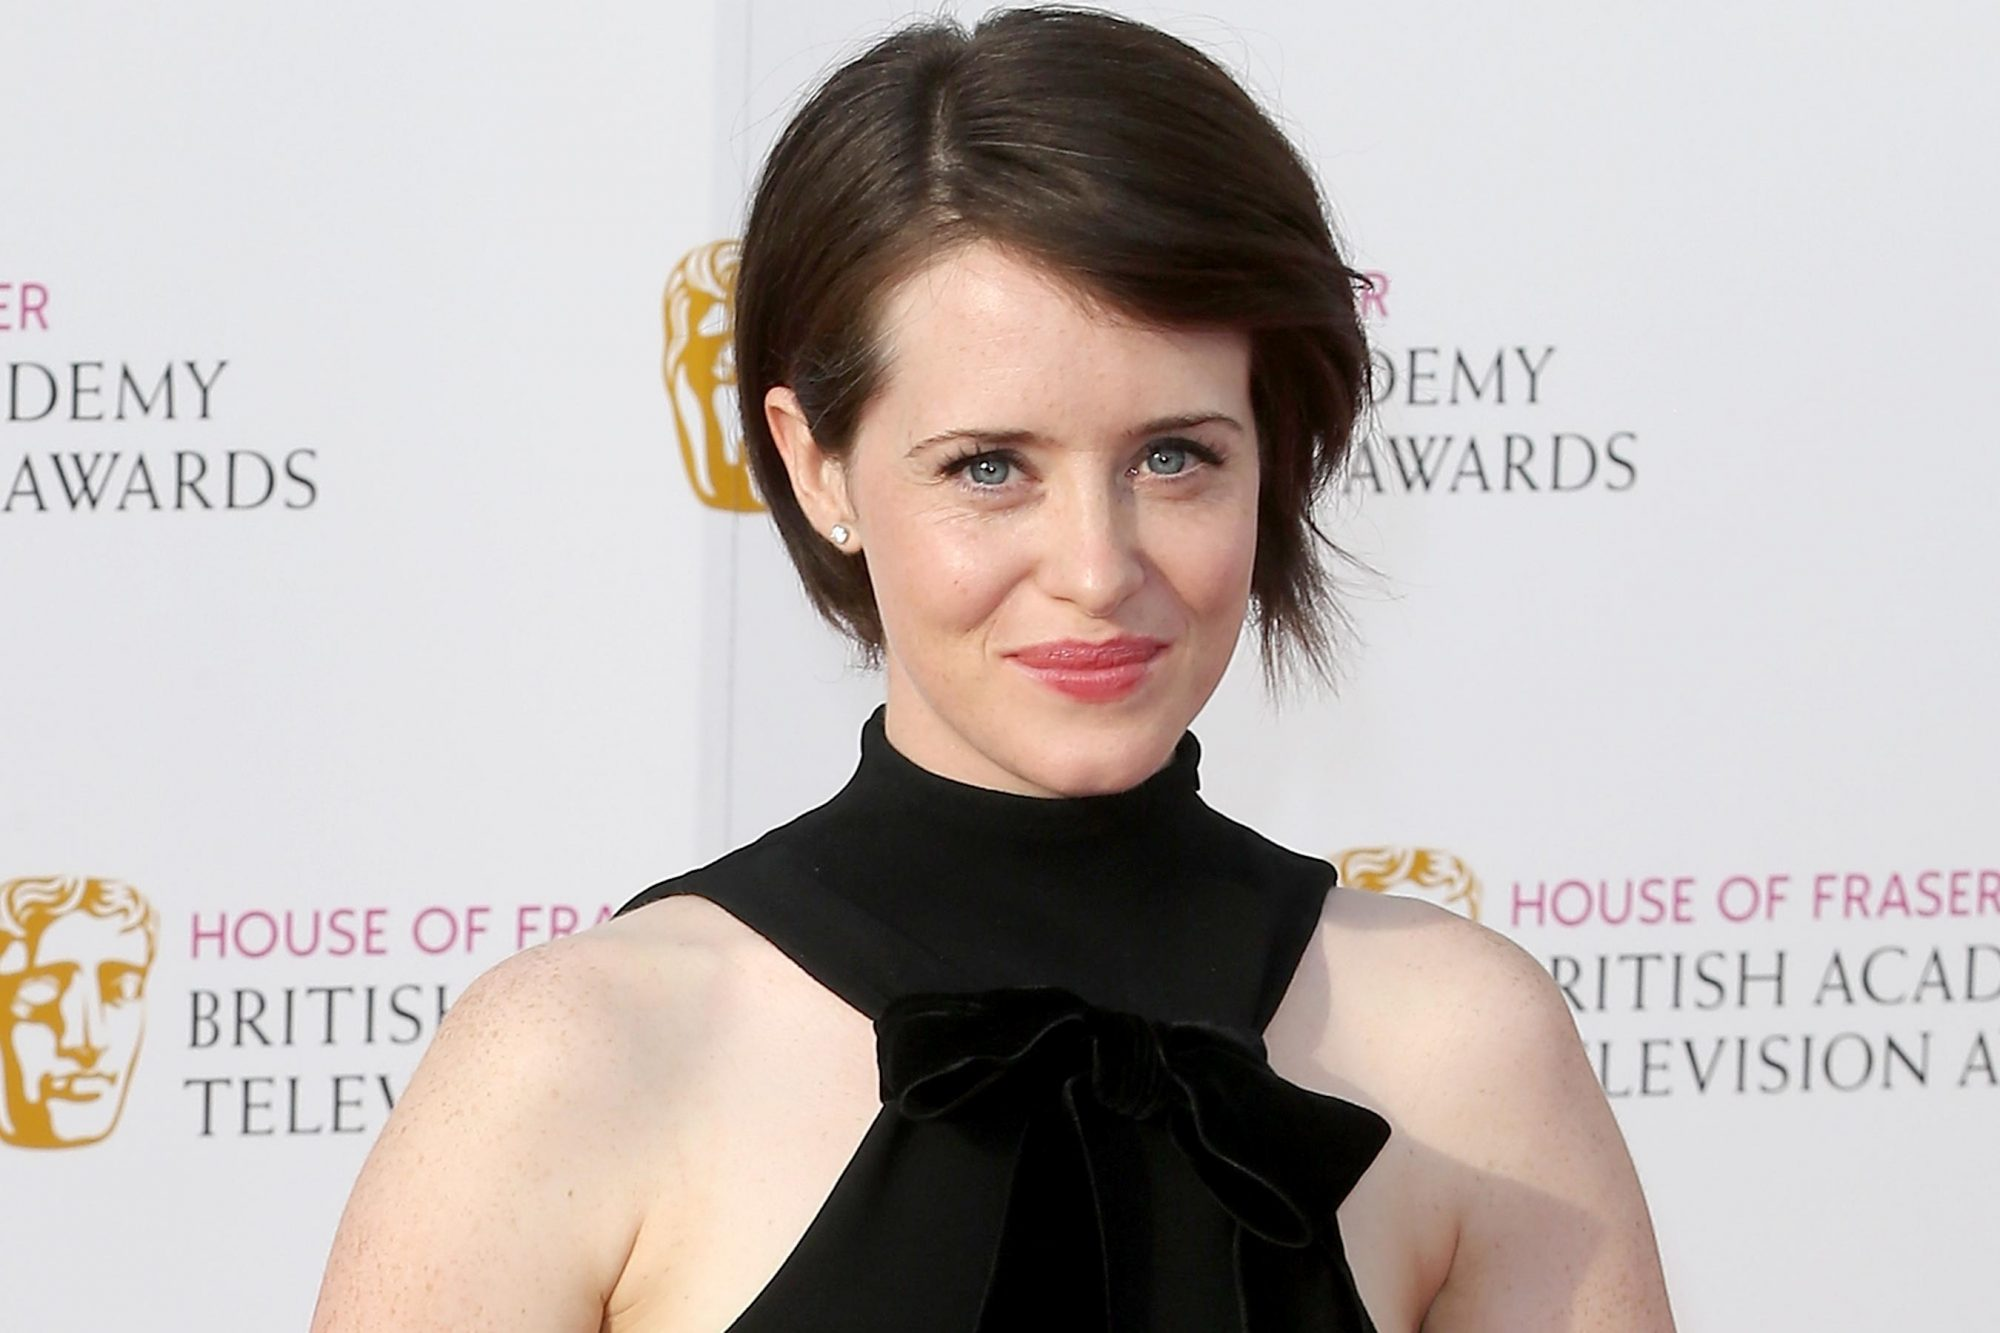 House Of Fraser British Academy Television Awards 2016